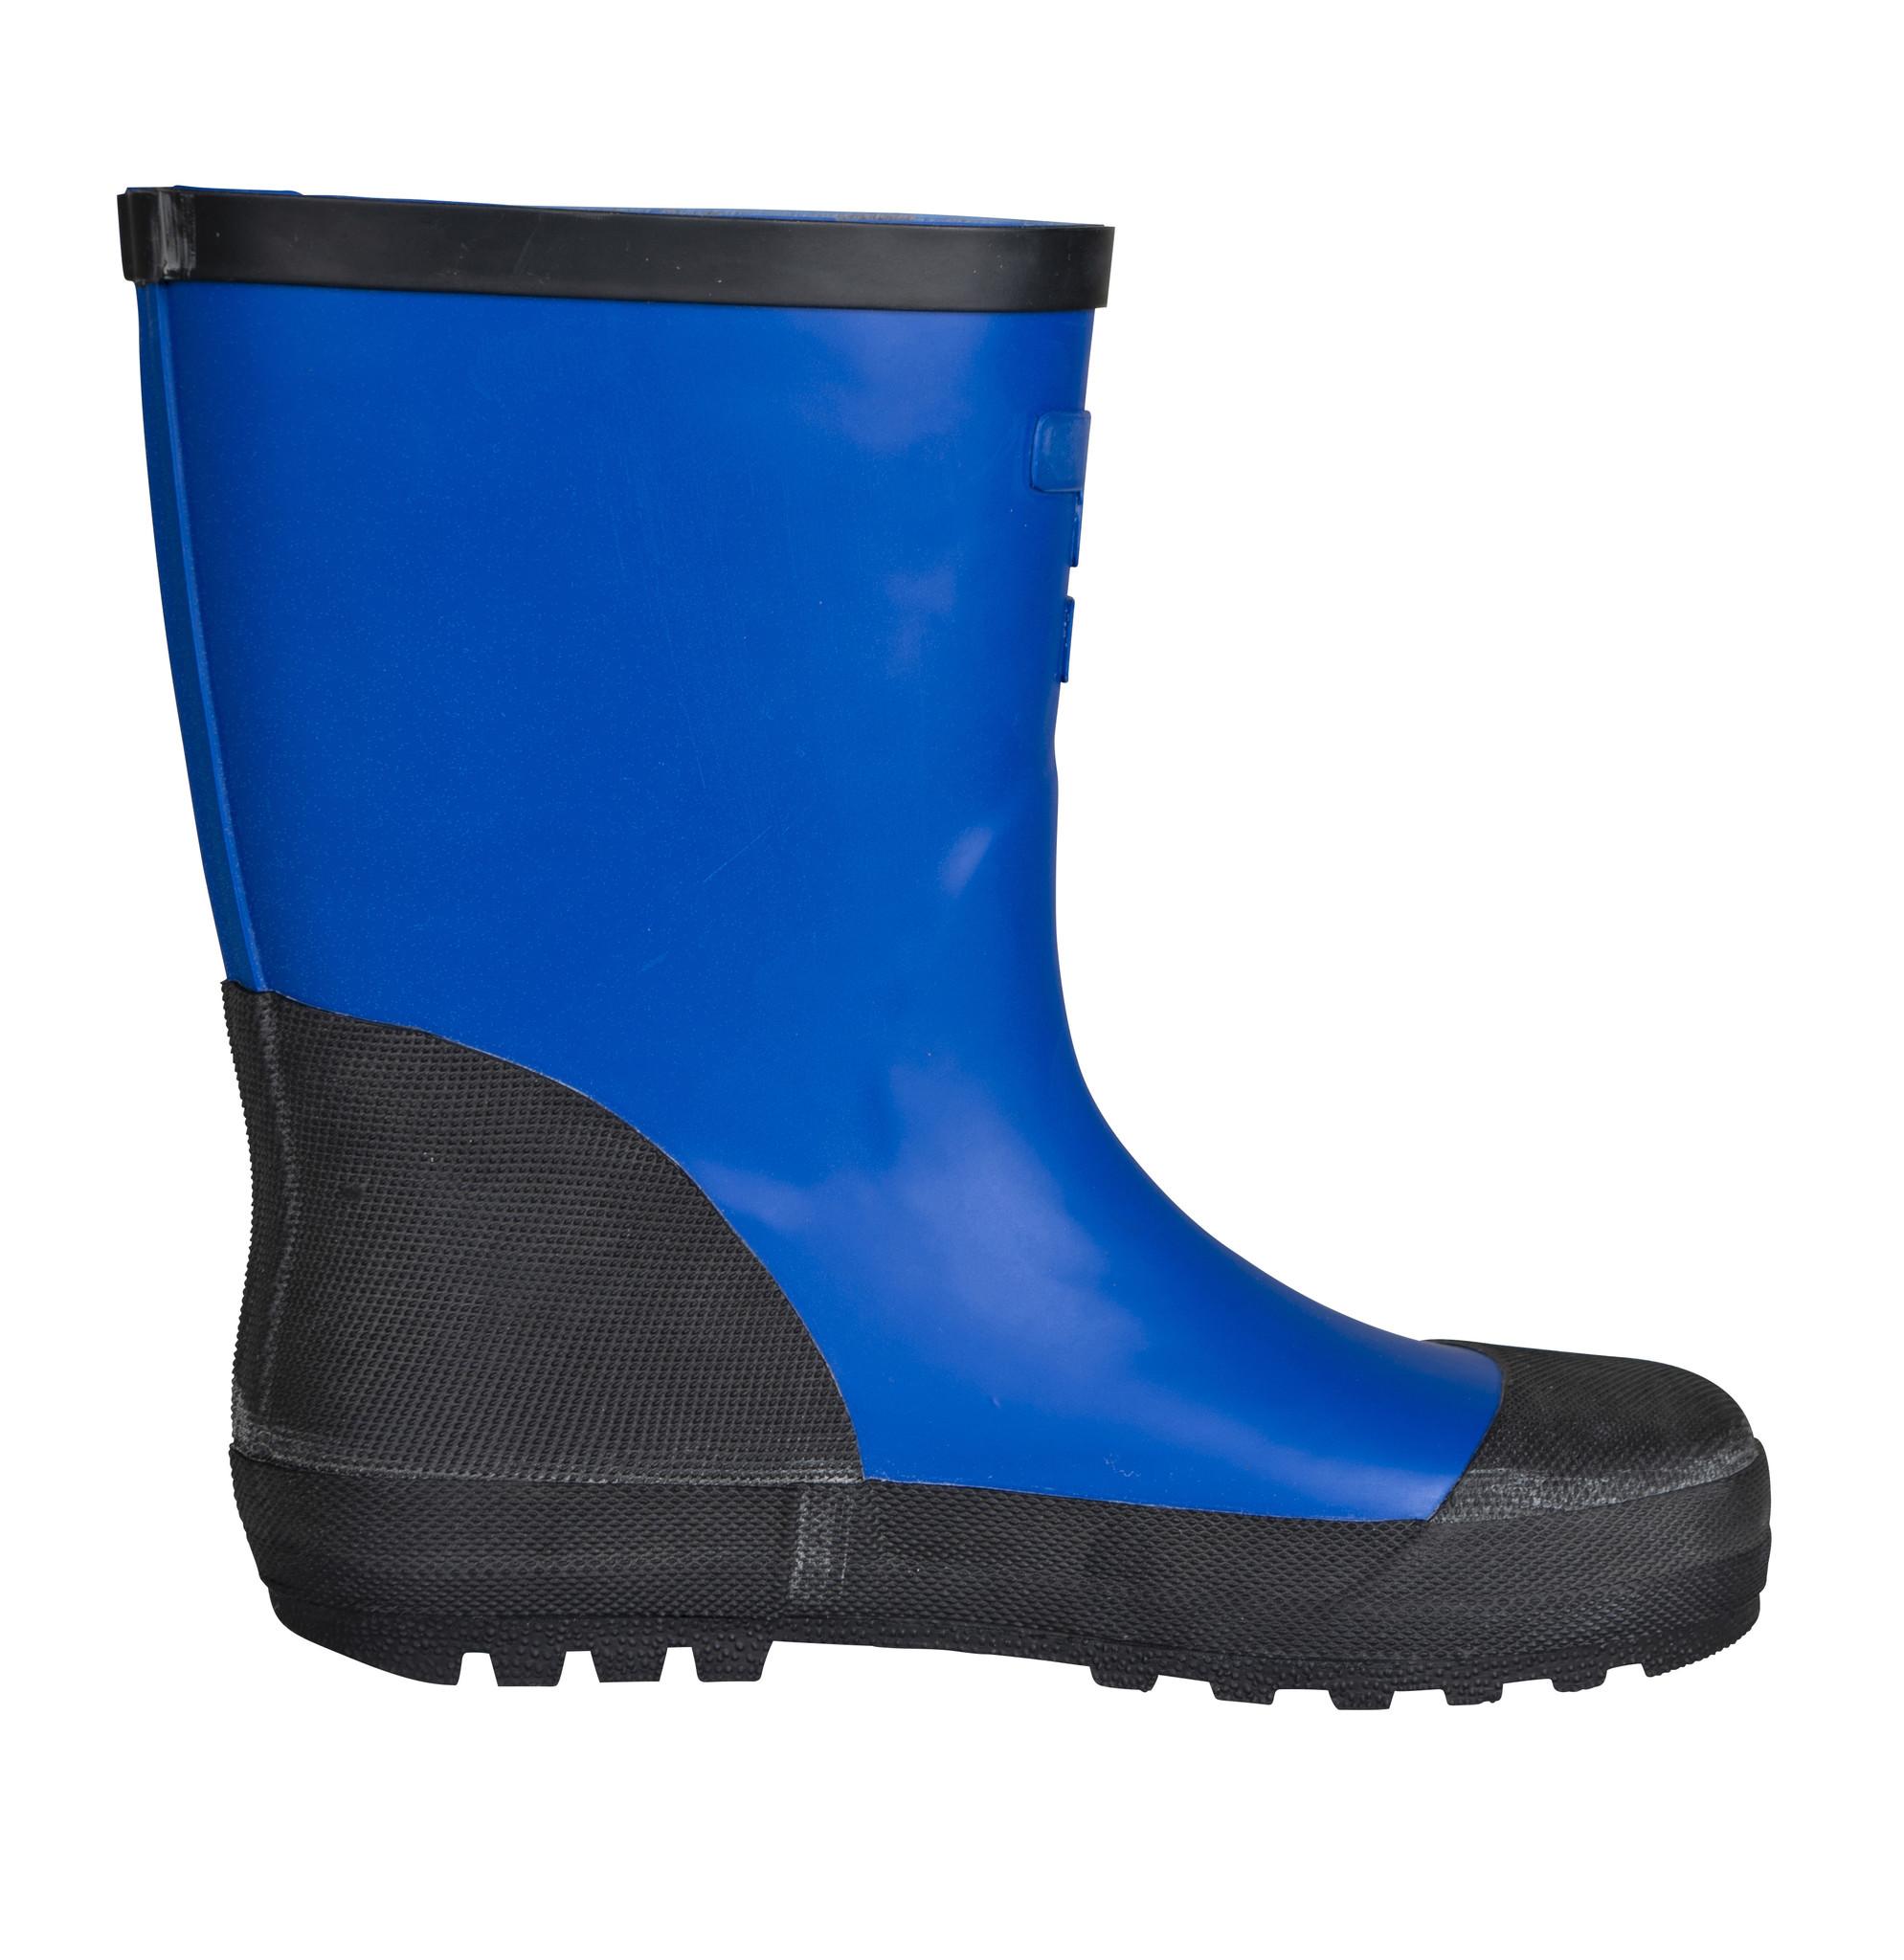 Tenson Stiefel Sec 7333019763202 22 Junior Boots Gummi 7920060 m0vN8nw